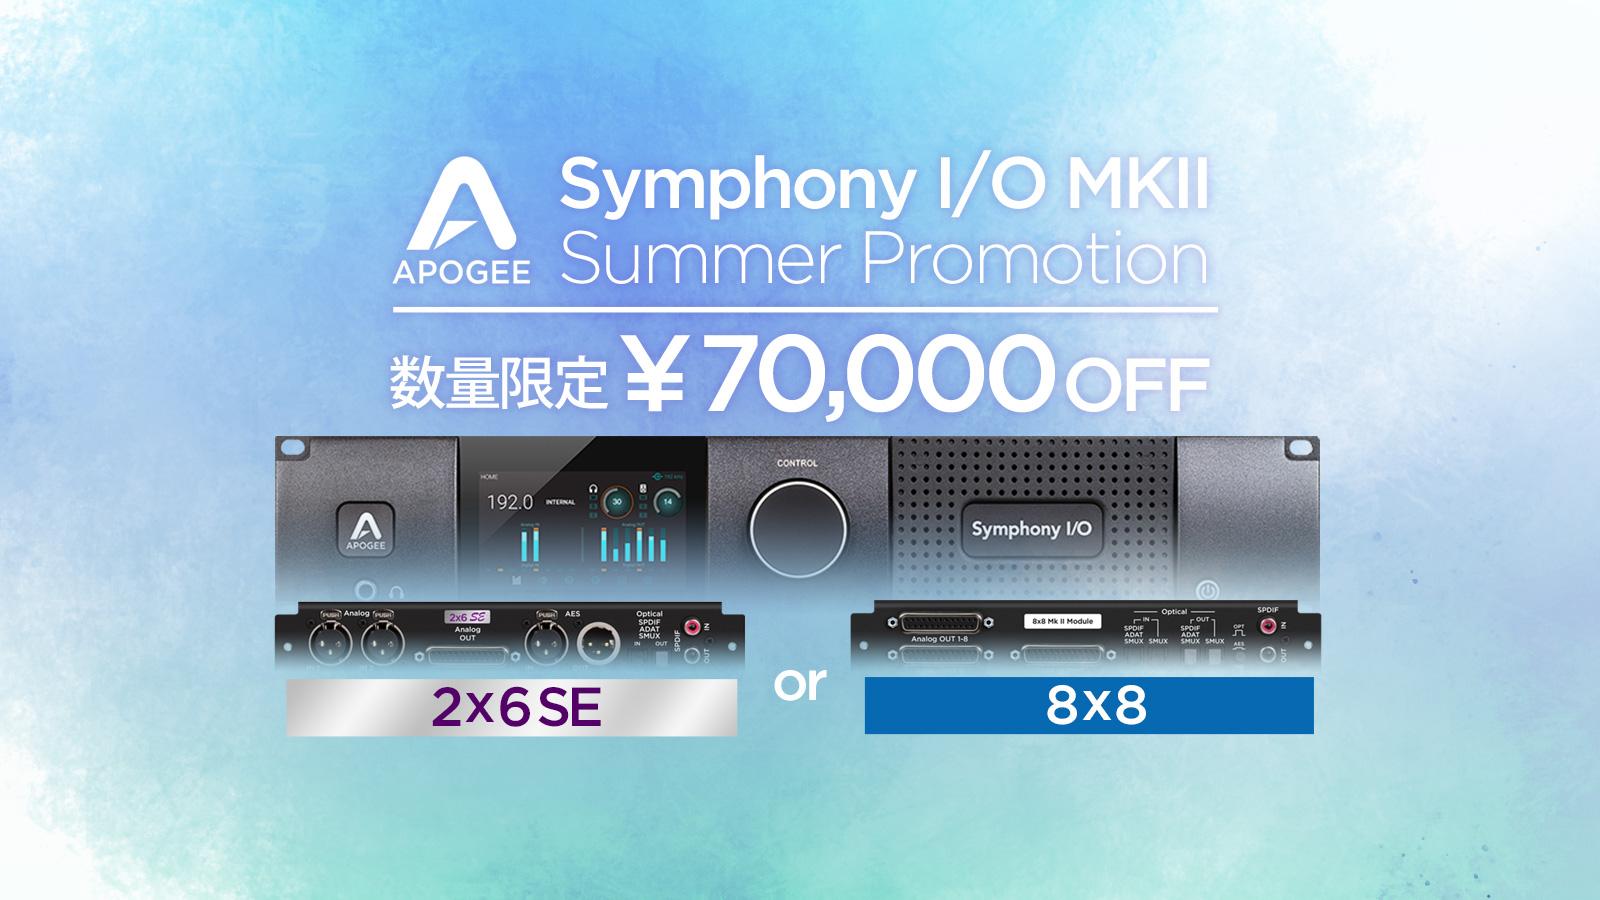 Apogee Symphony I/O MKII Summer Promotion